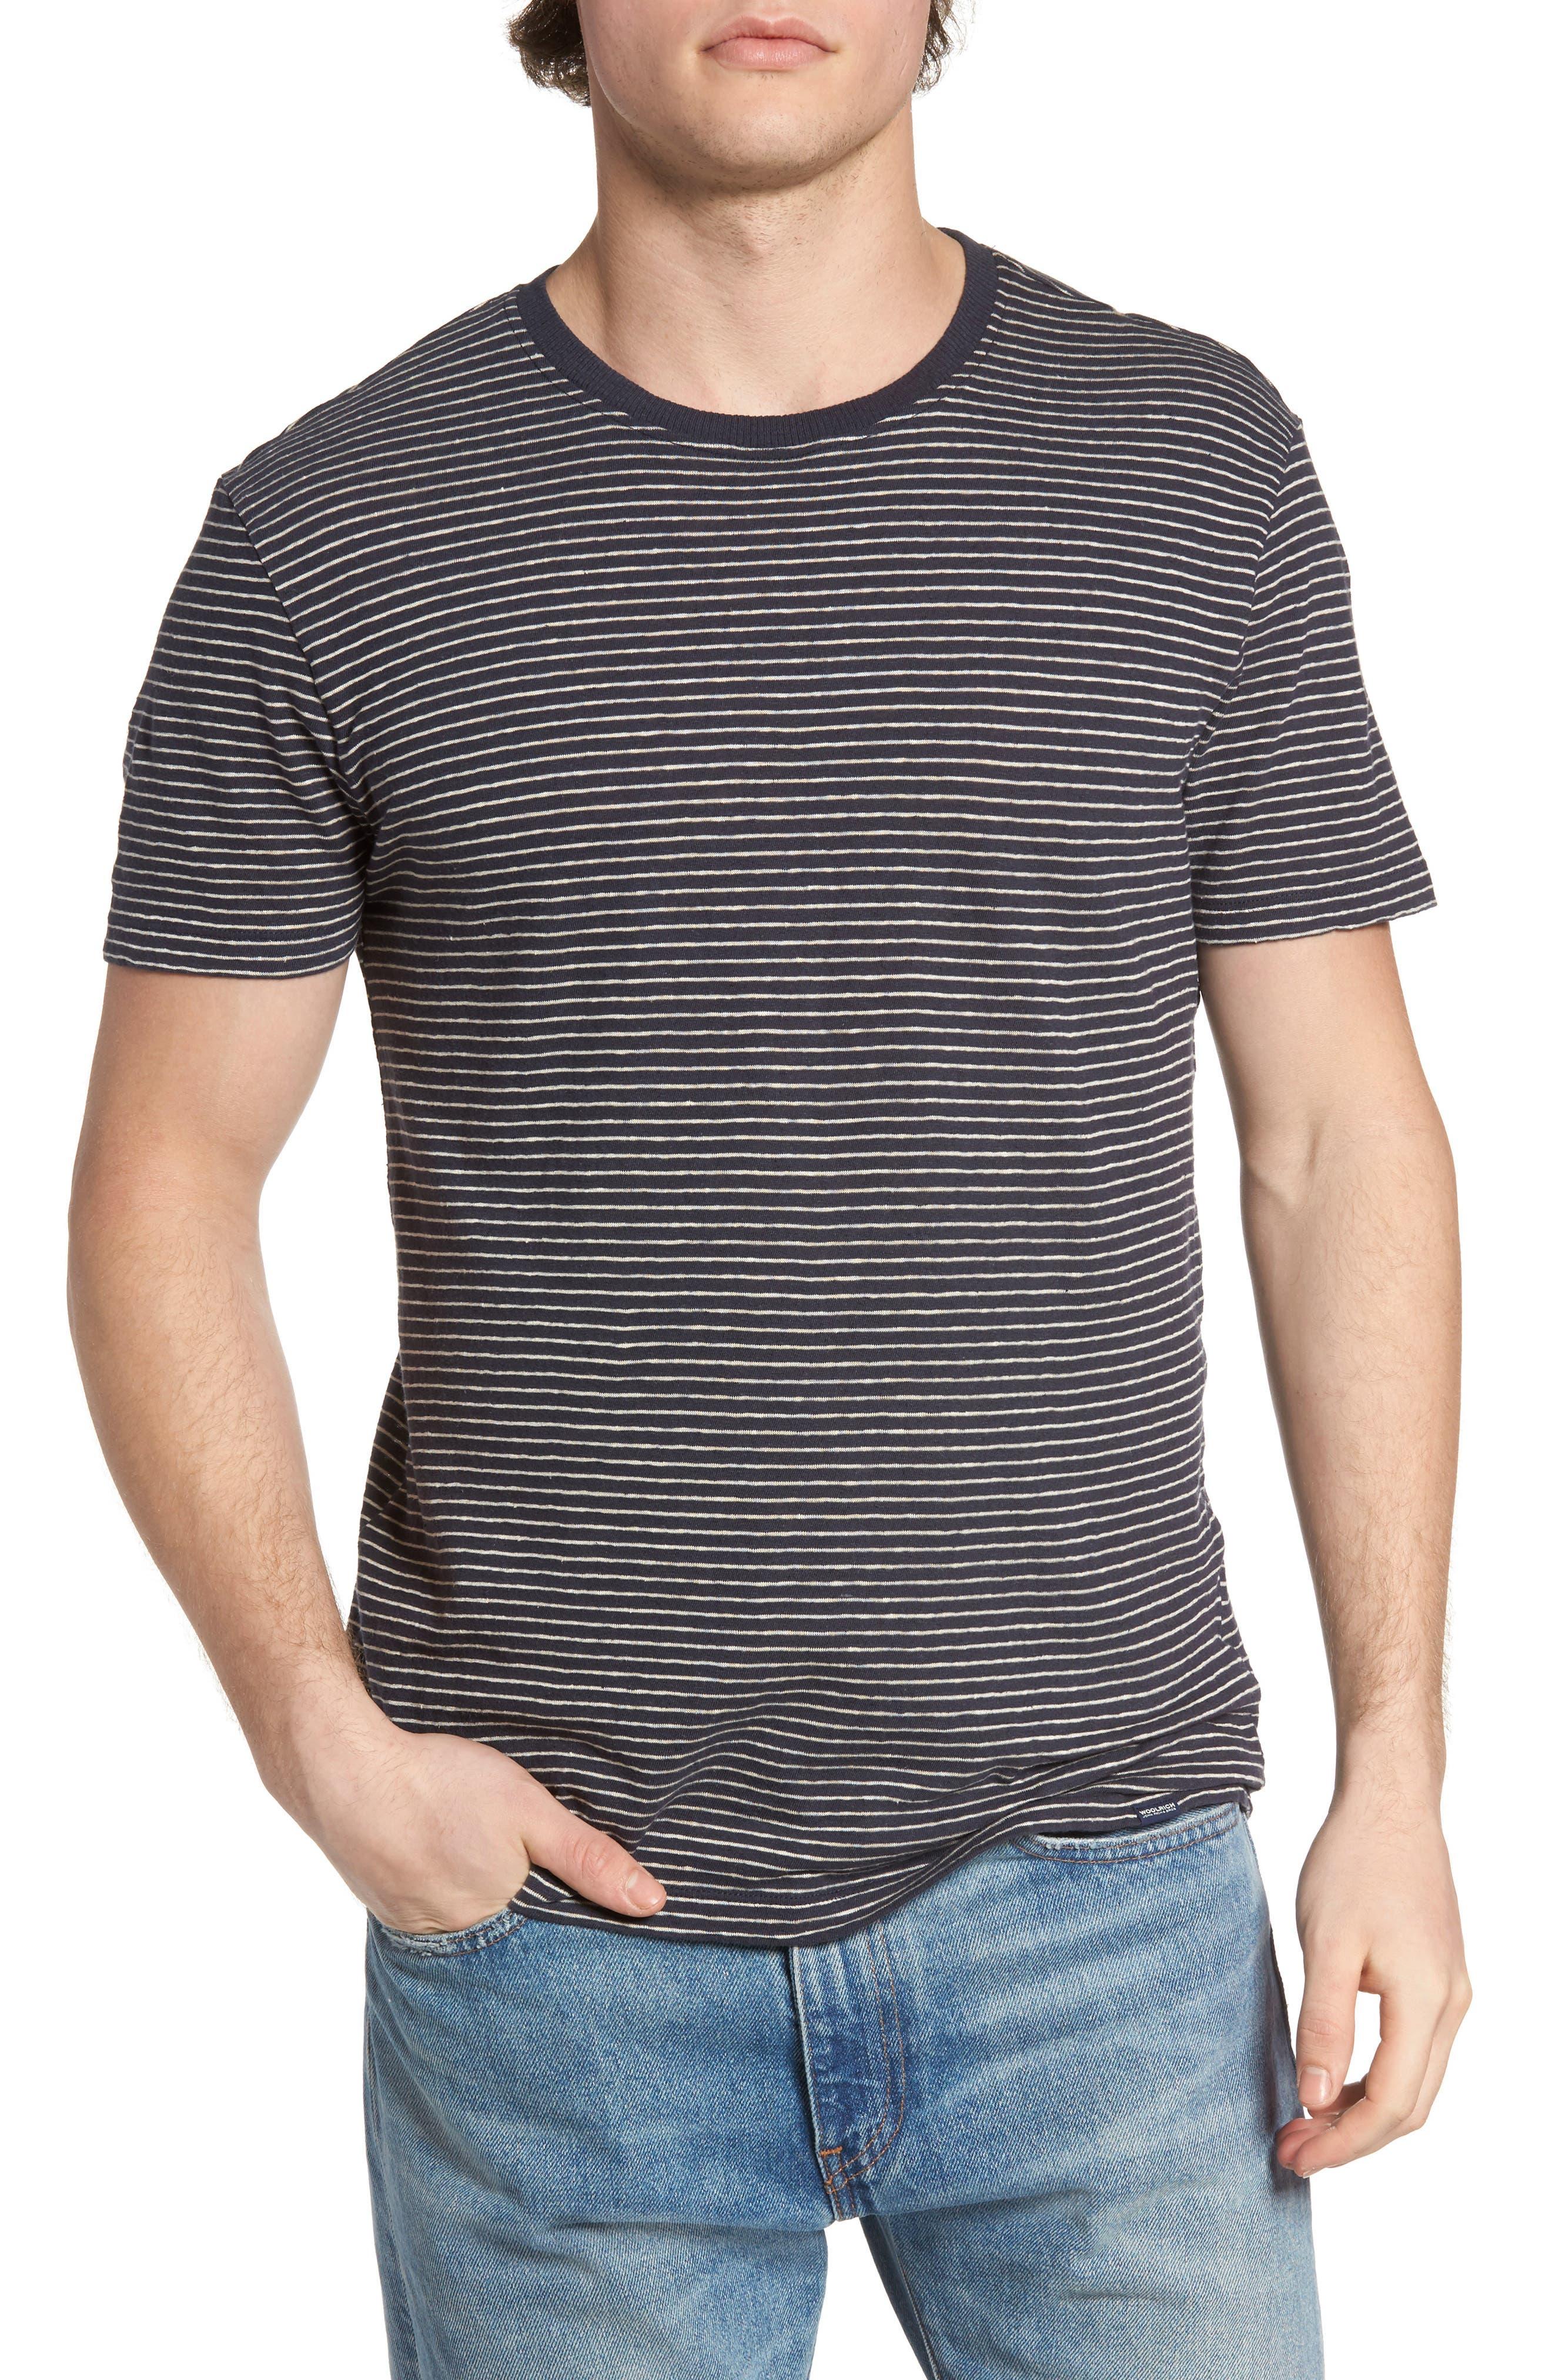 John Rich Stripe Cotton & Linen T-Shirt,                             Main thumbnail 1, color,                             460